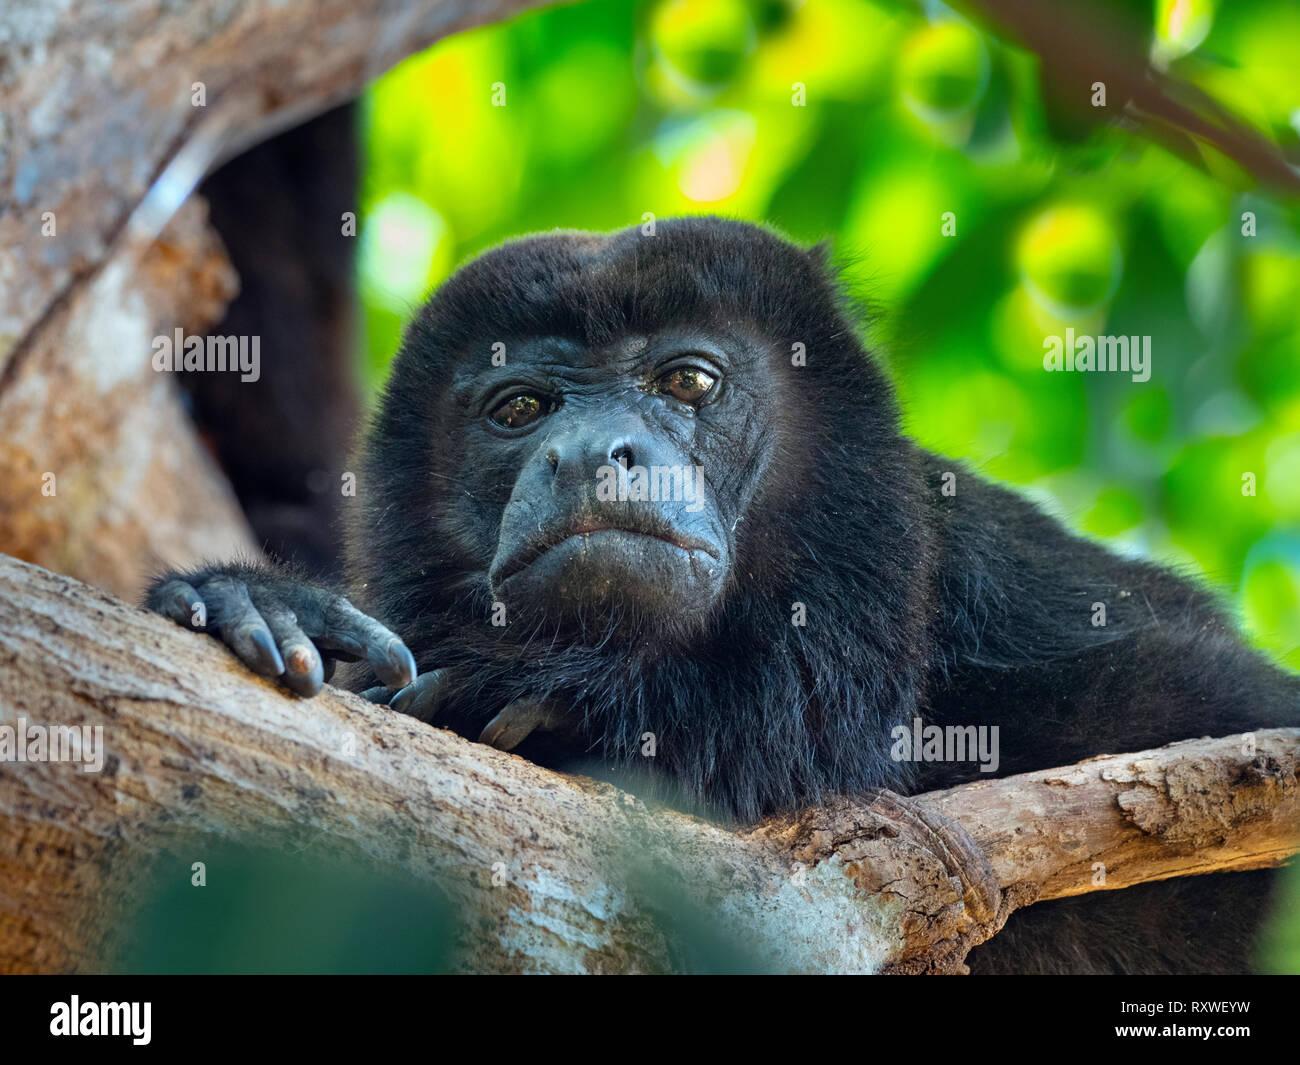 Howler monkey Alouatta caraya Costa Rica February - Stock Image